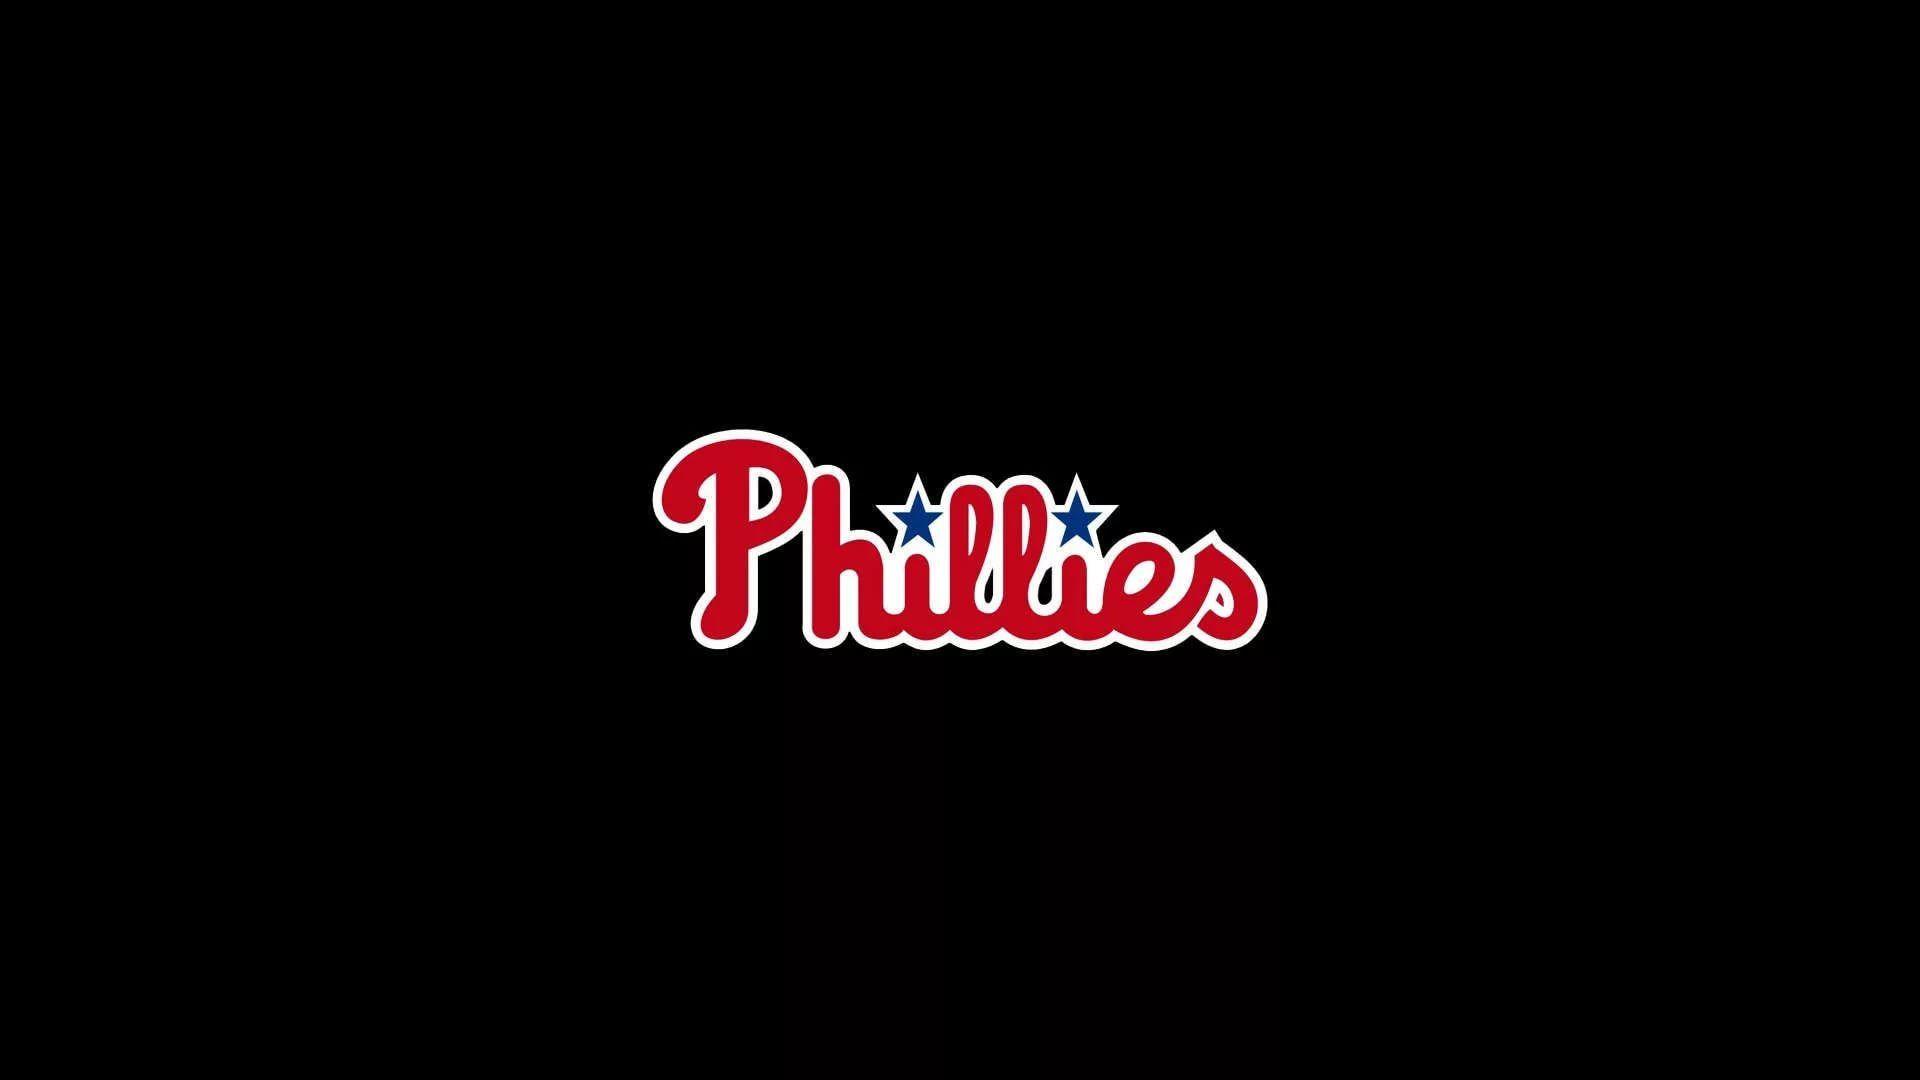 Phillies Logo wallpaper image hd